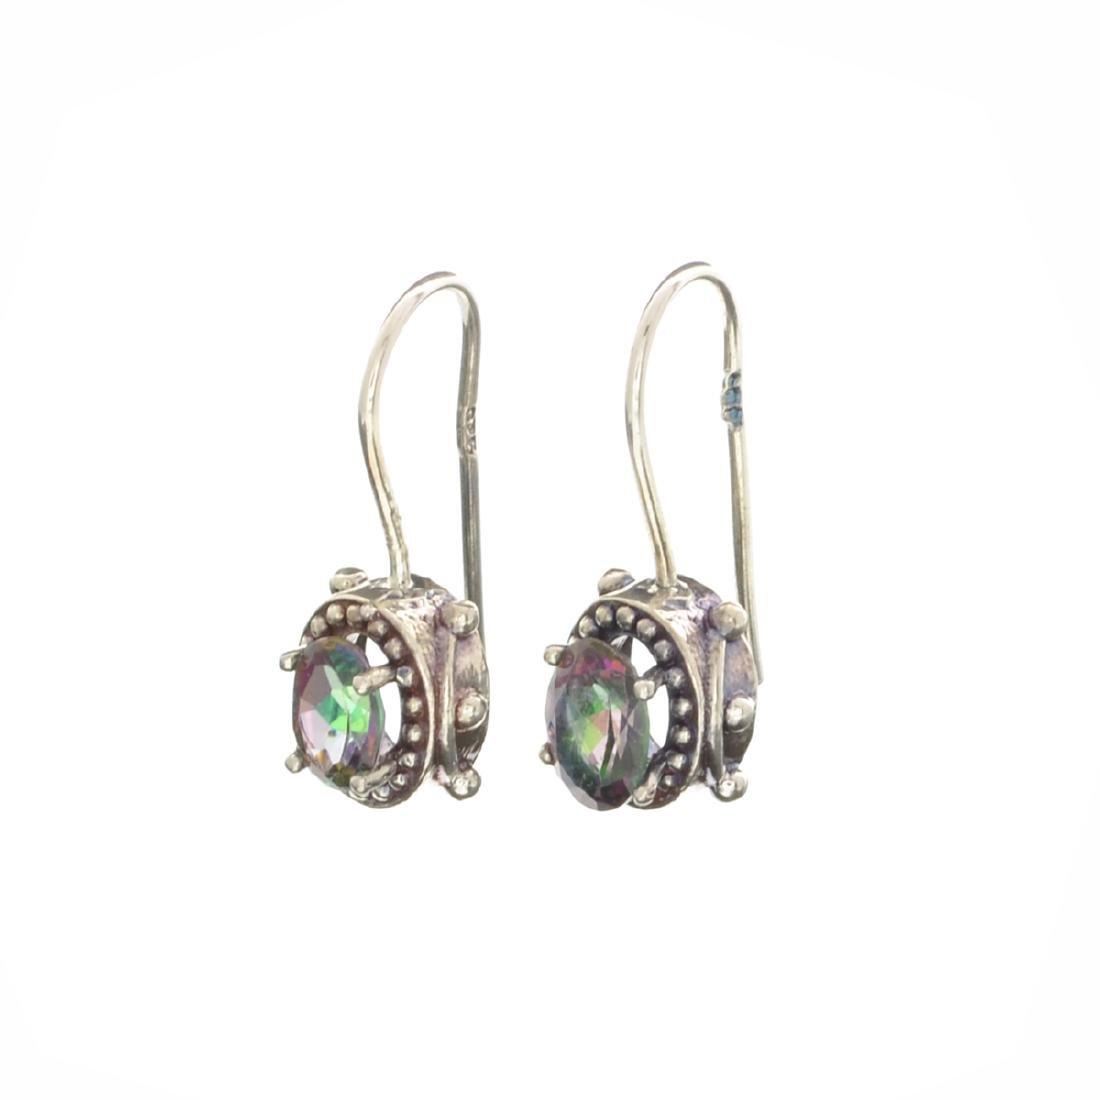 APP: 0.5k Fine Jewelry Designer Sebastian 1.82CT Oval